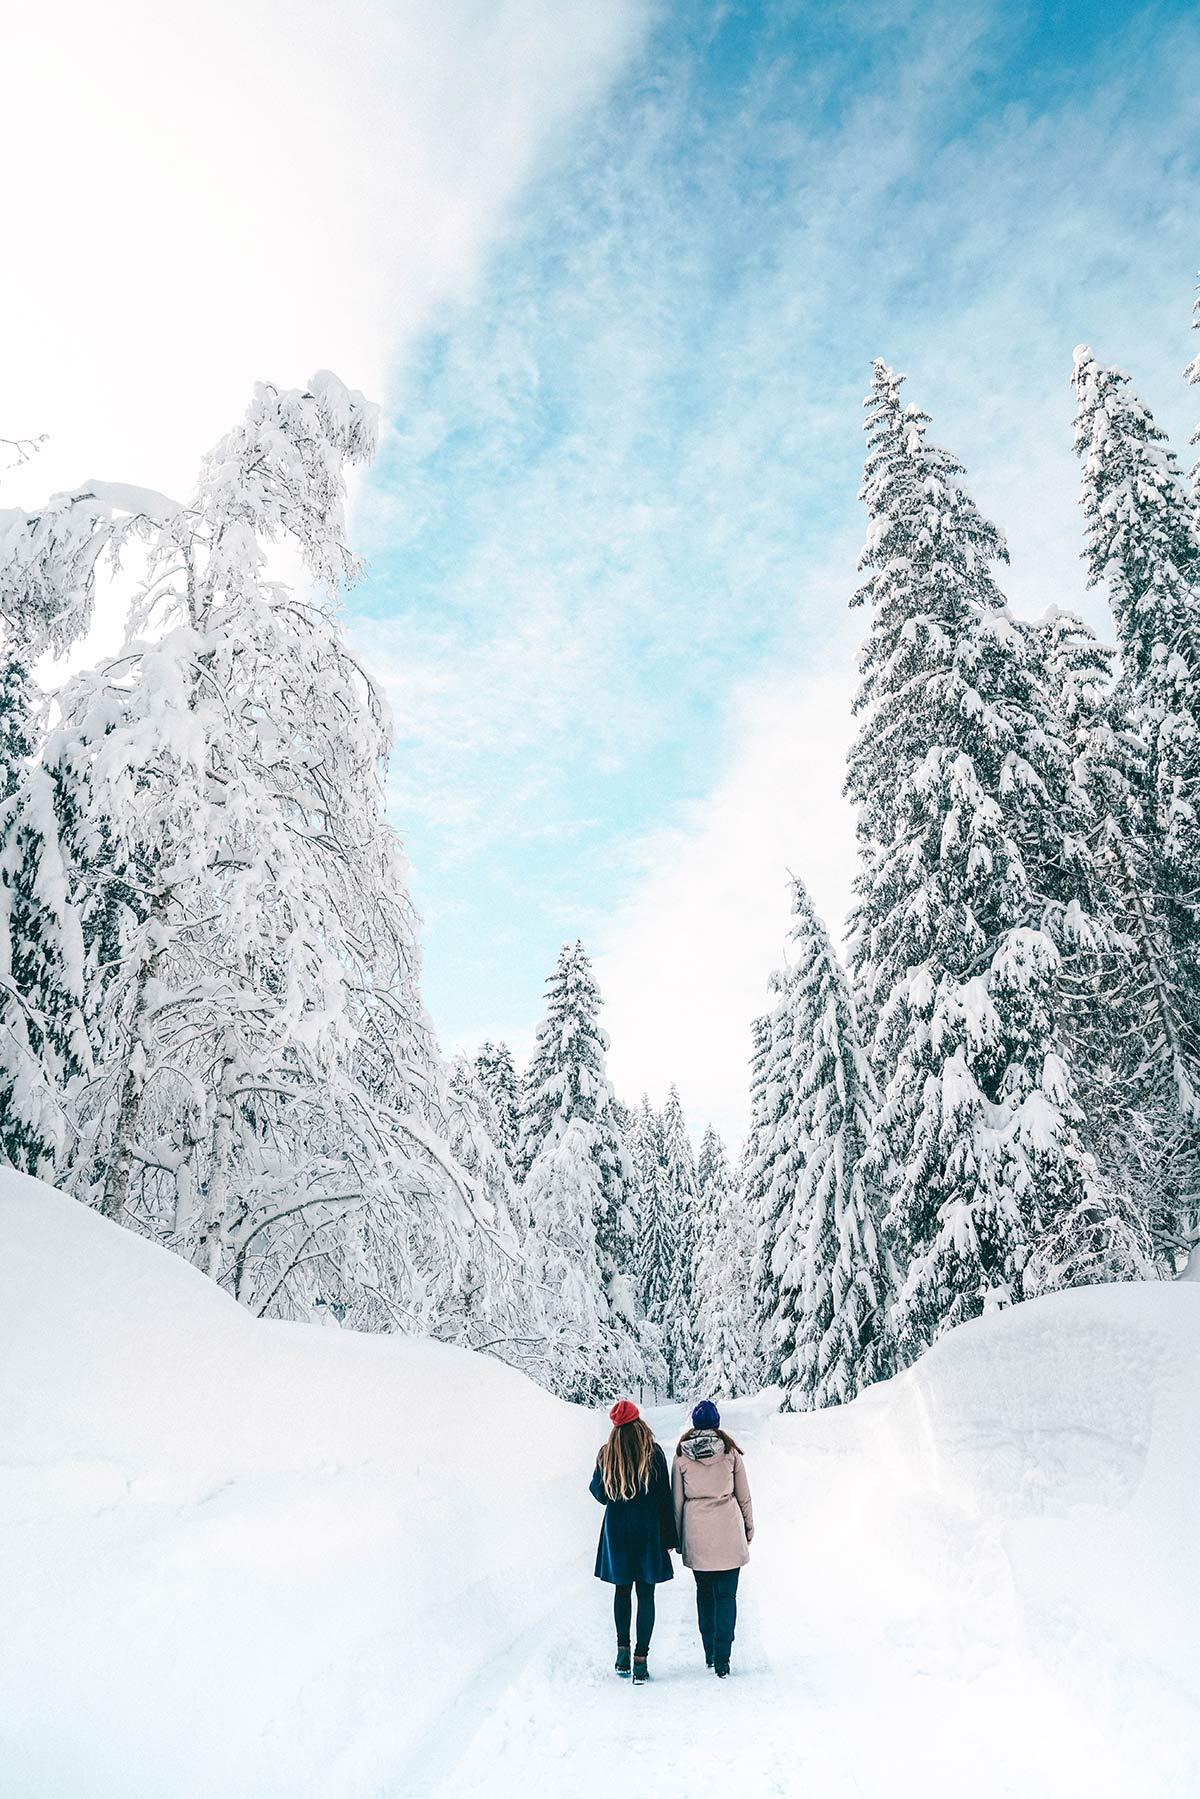 Winterlandschaft Saalbach Hinterklemm Leogang